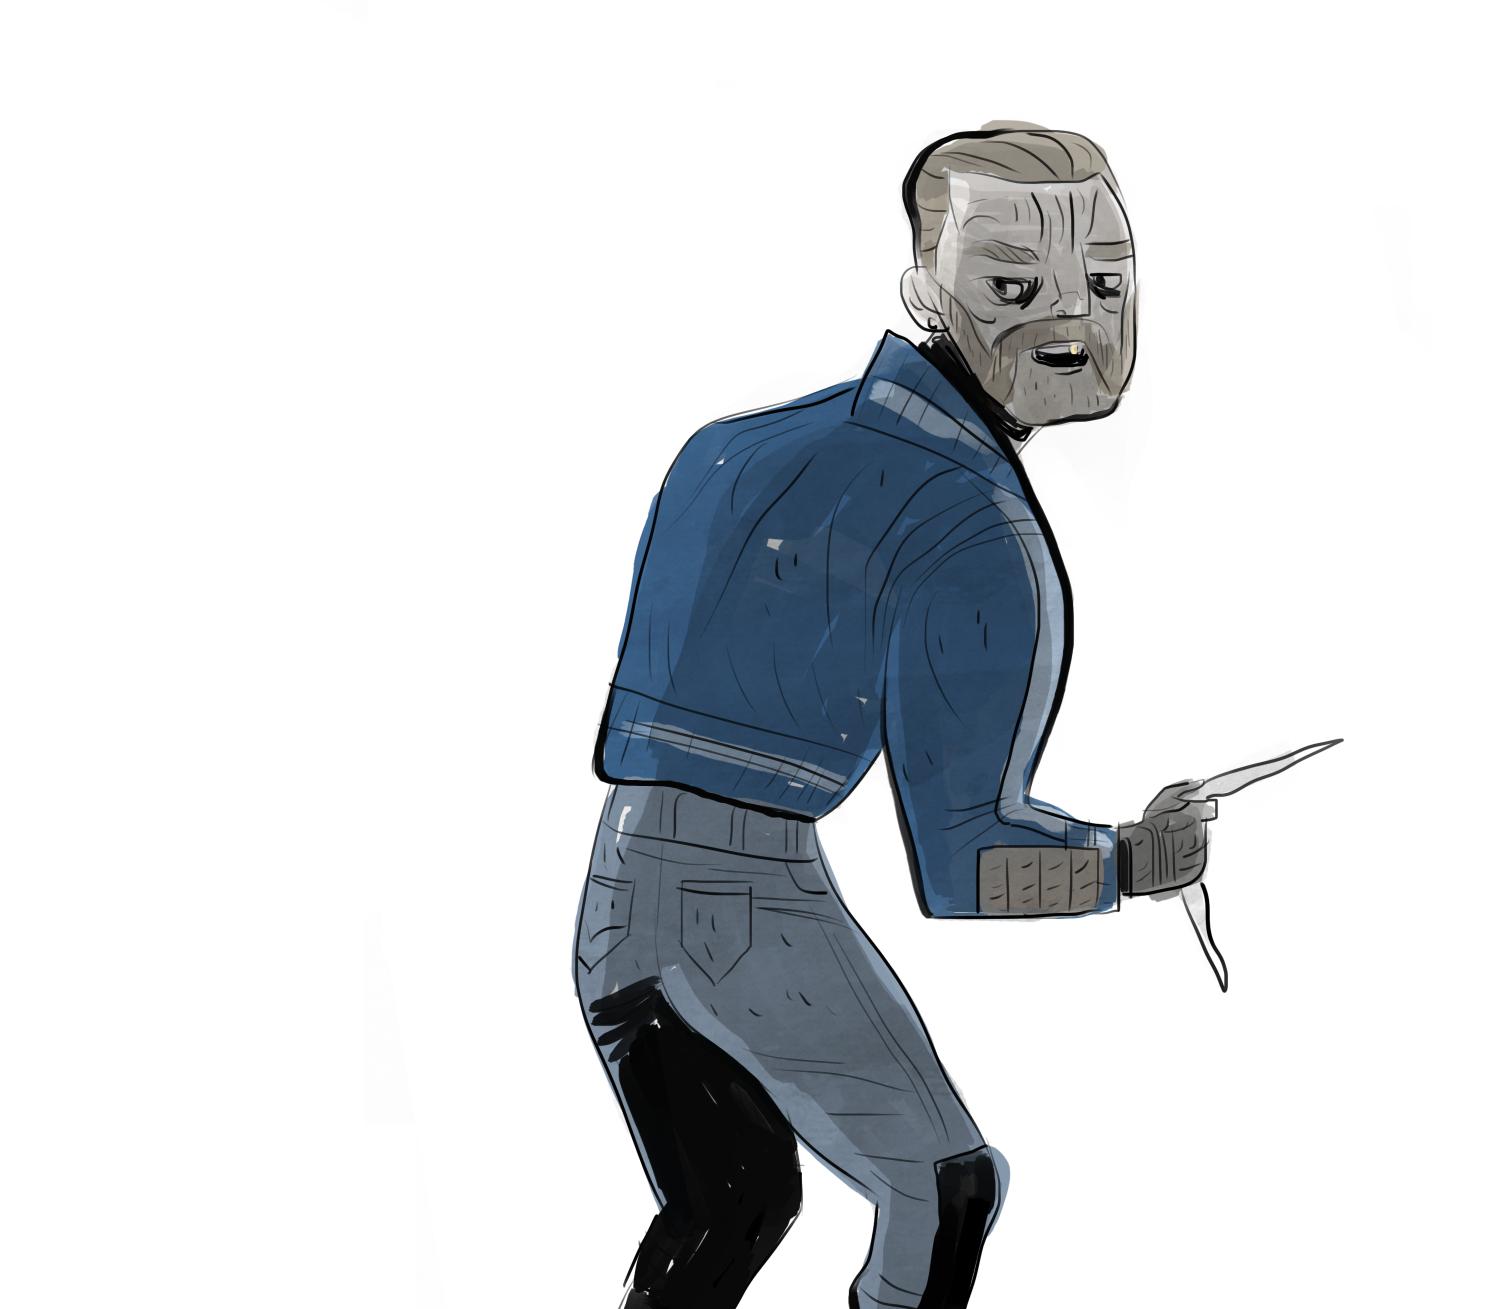 Suicide Squad's Captain Boomerang